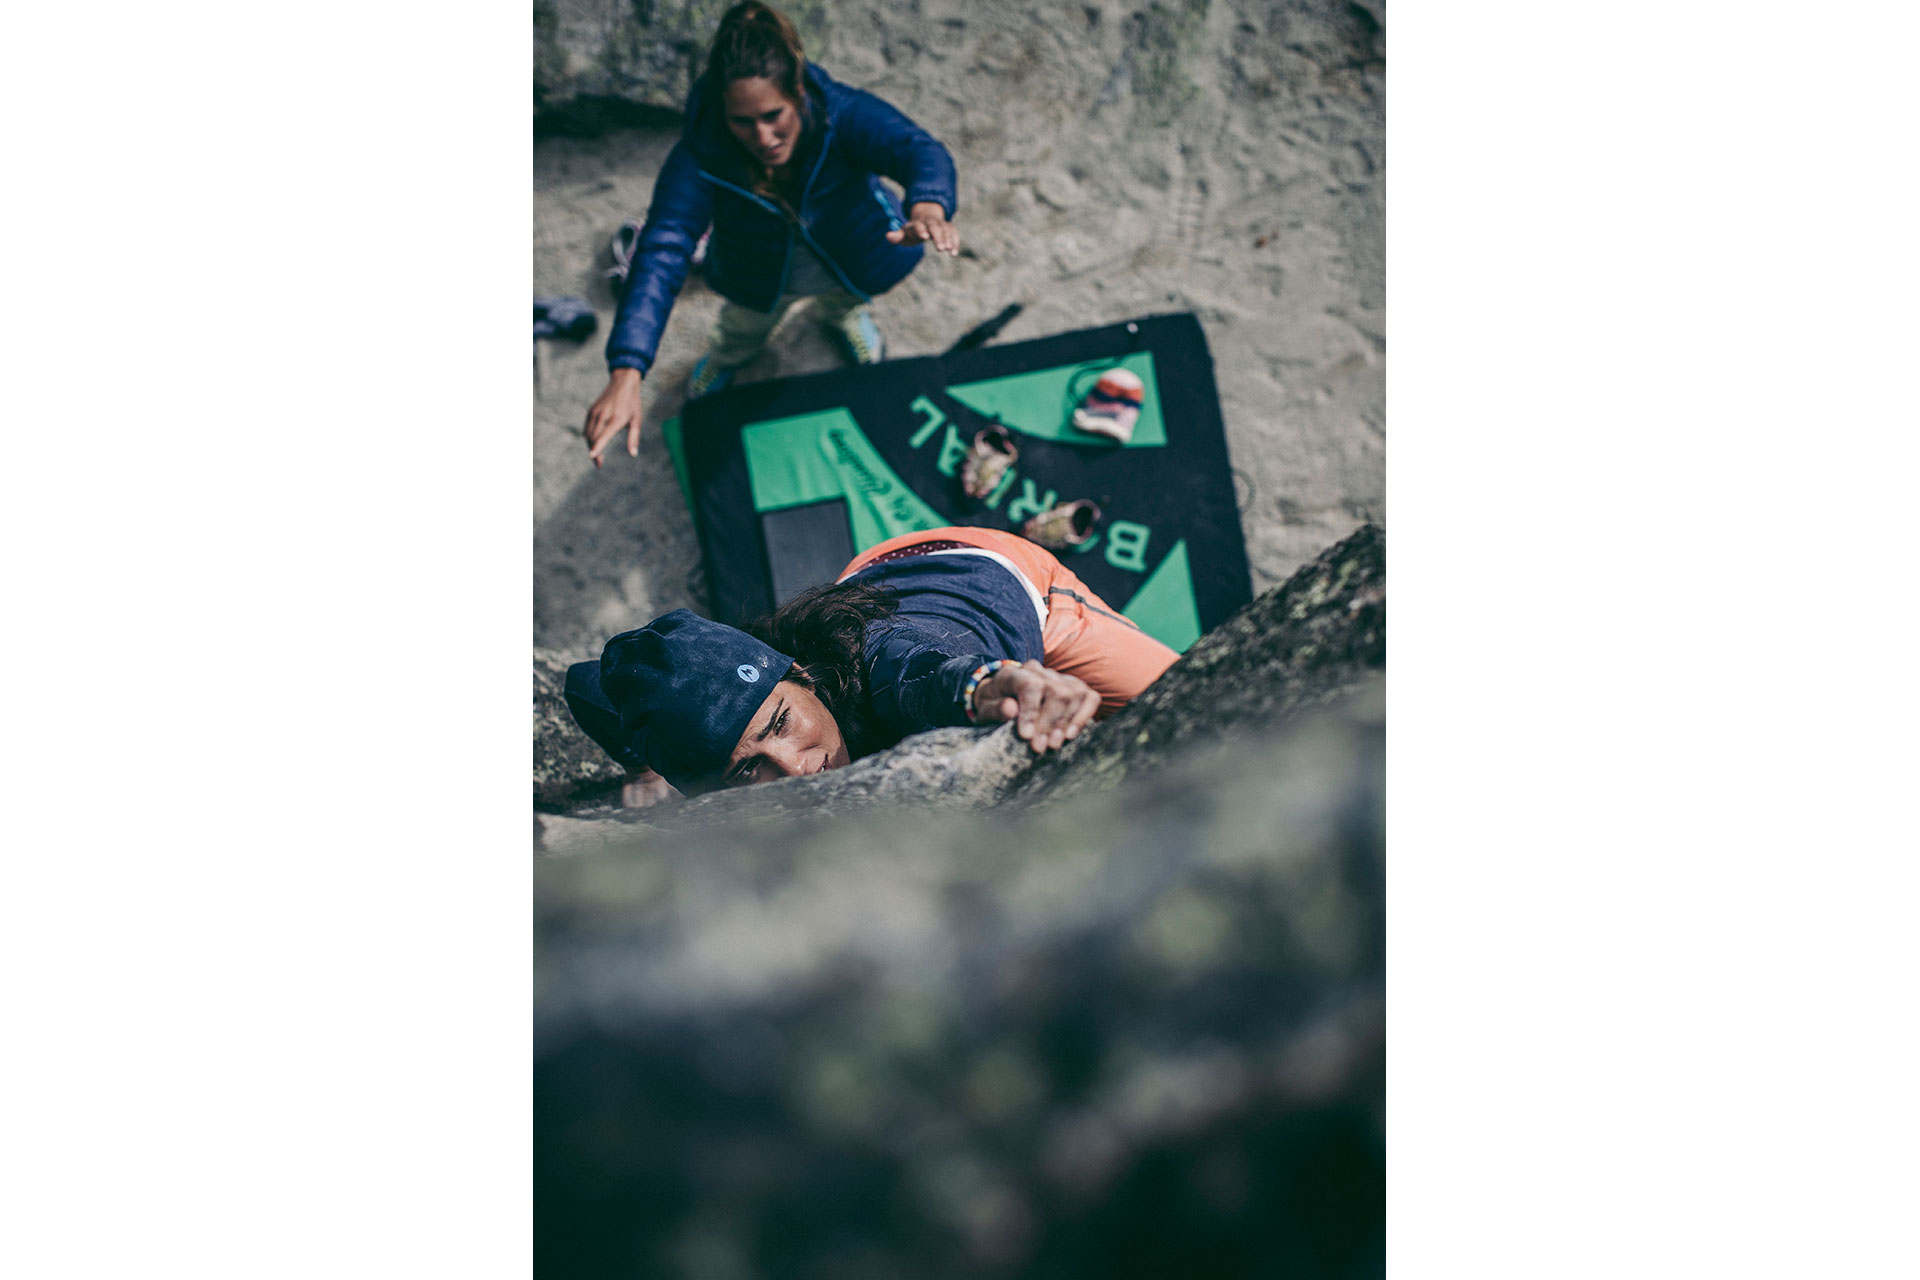 Berge Outdoor Sport Klettern Bouldern Fotograf Michael Müller Berlin